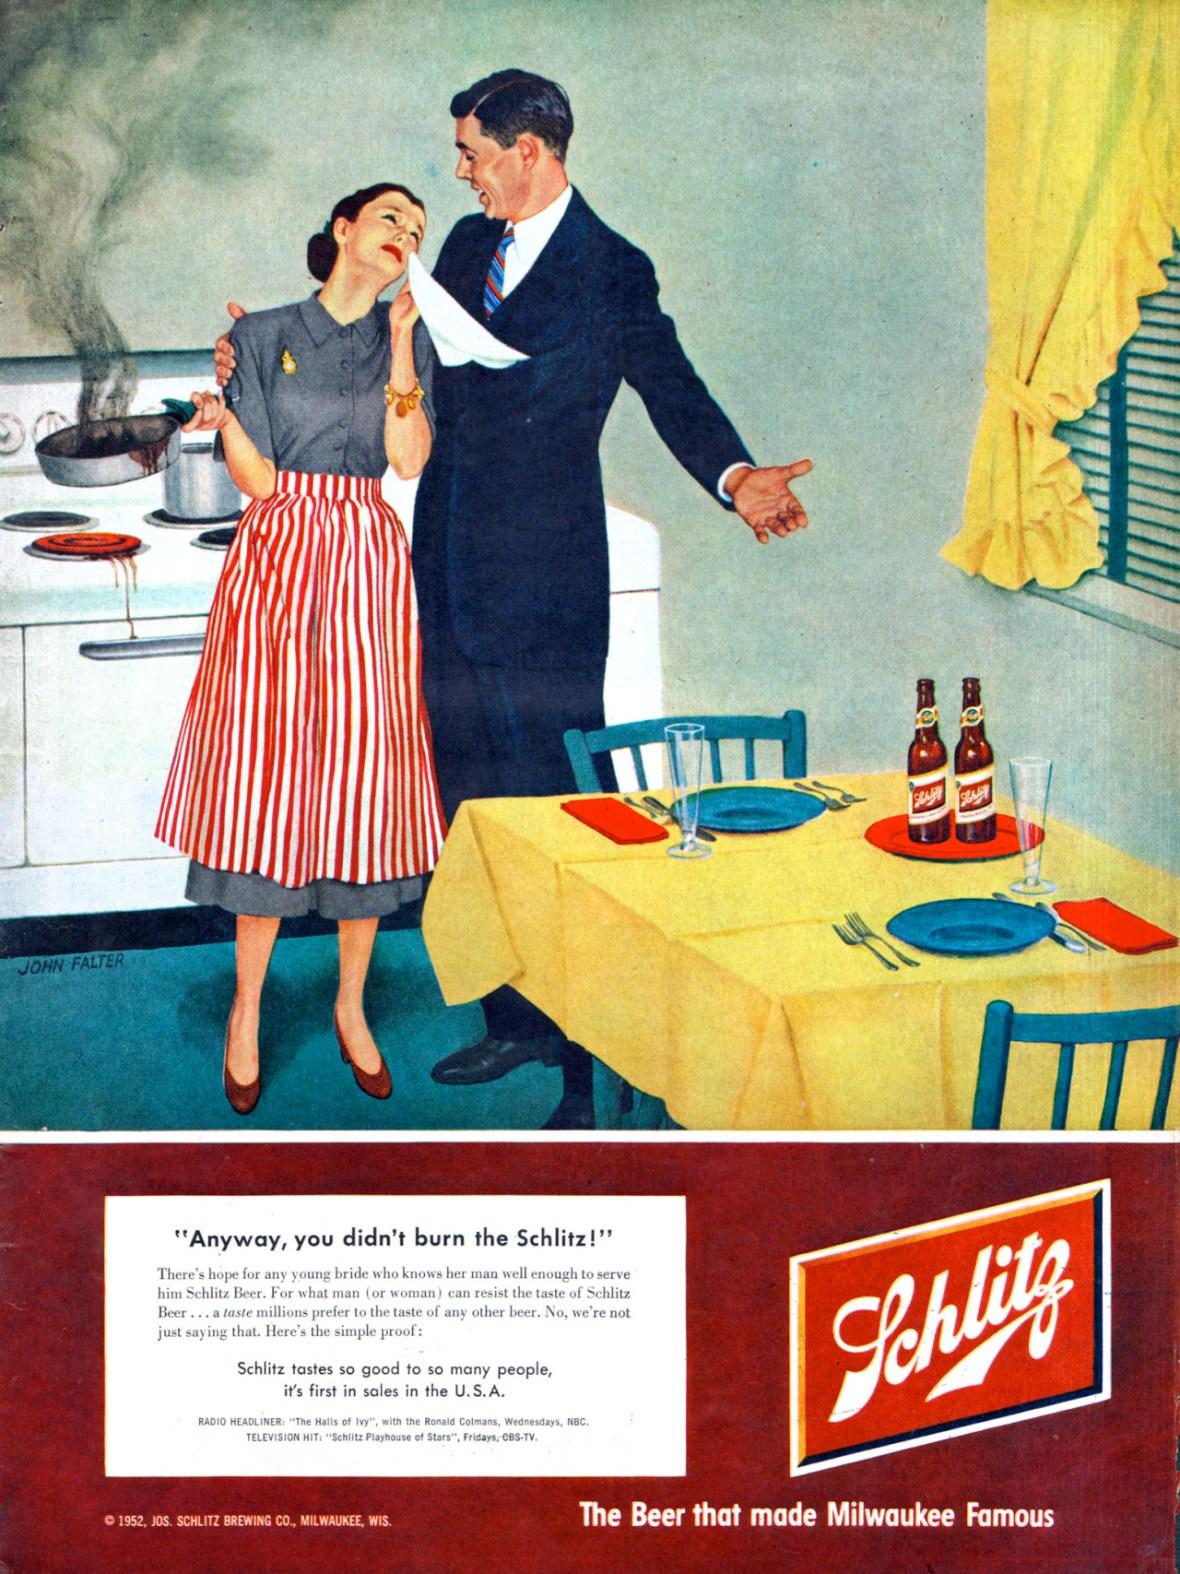 Joseph Schlitz Brewing Company - 1952